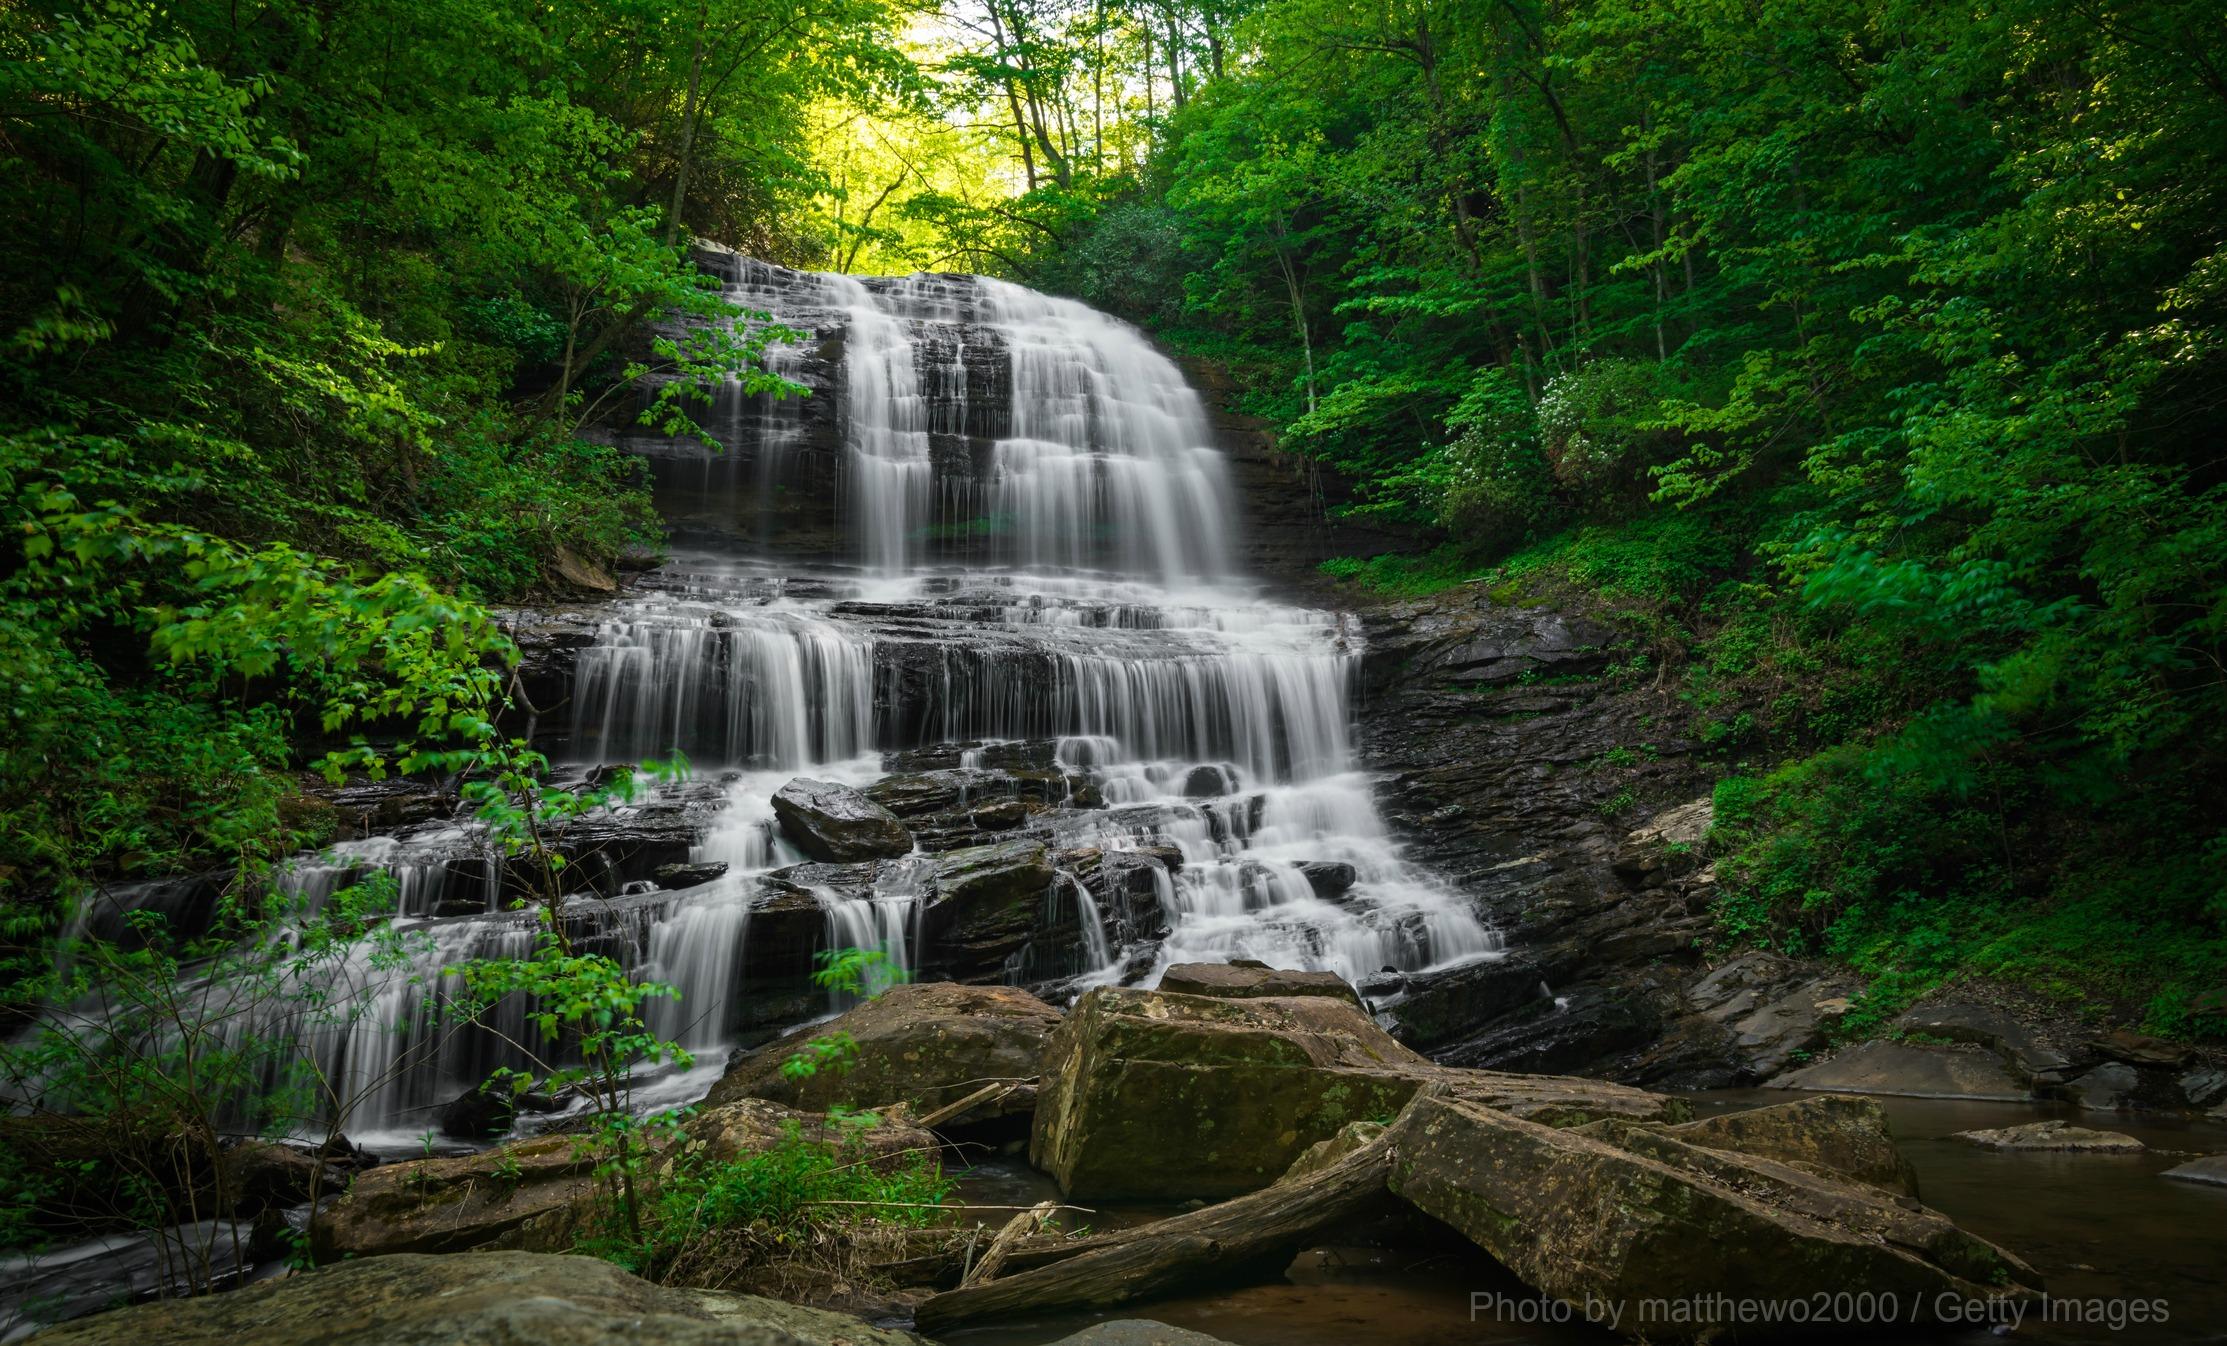 Hiking Pearson's Falls